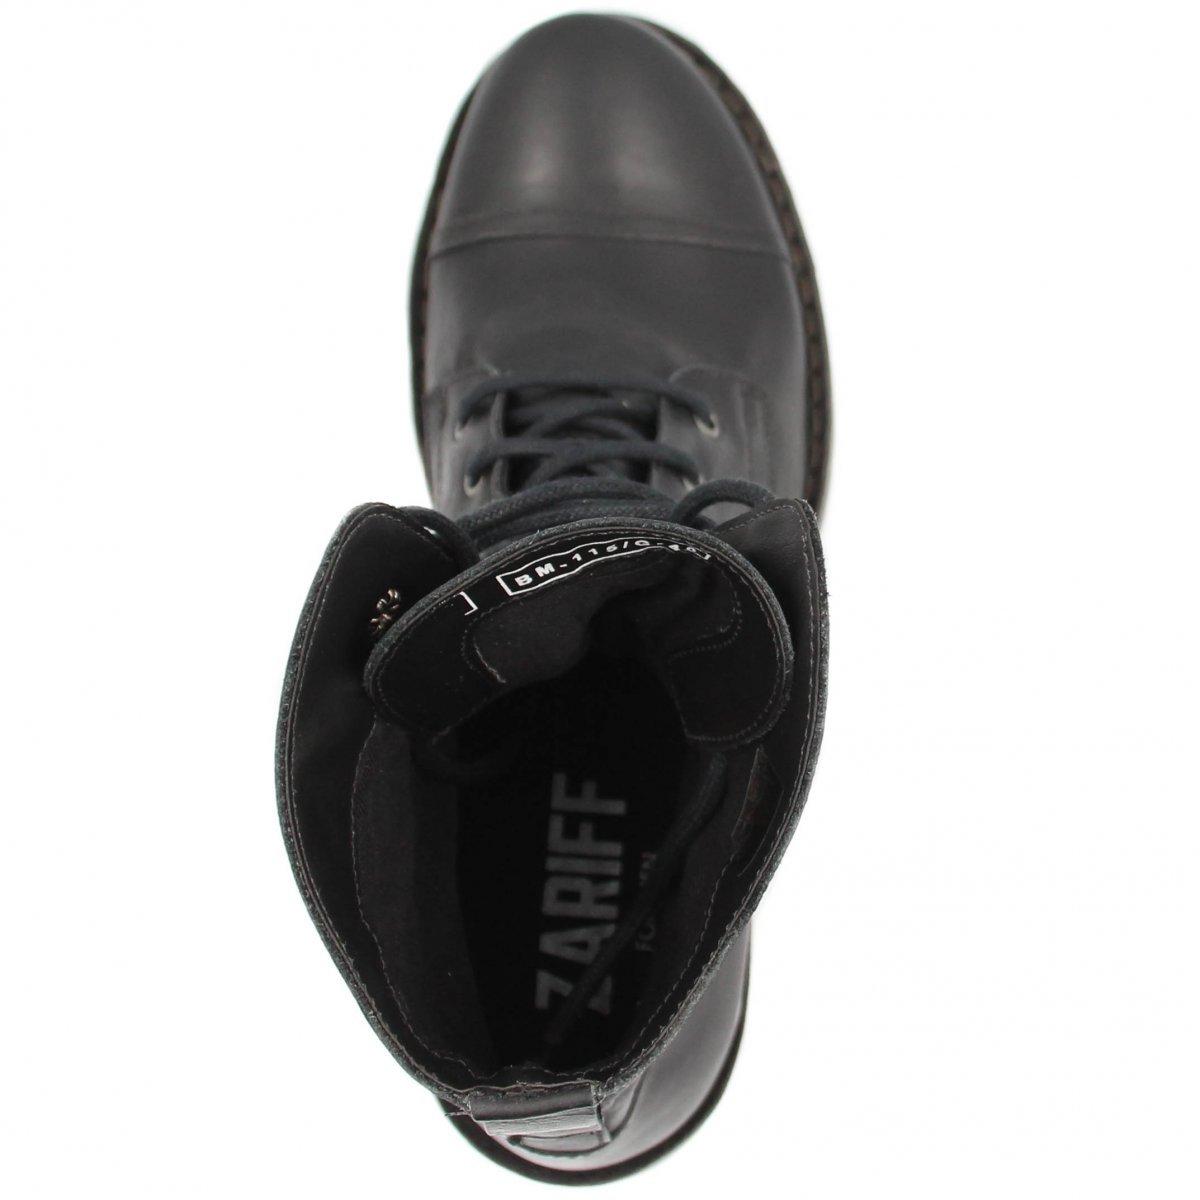 Couro Bota Masculina Preto em Shoes Bota Zariff Coturno Zariff RzRwpqY